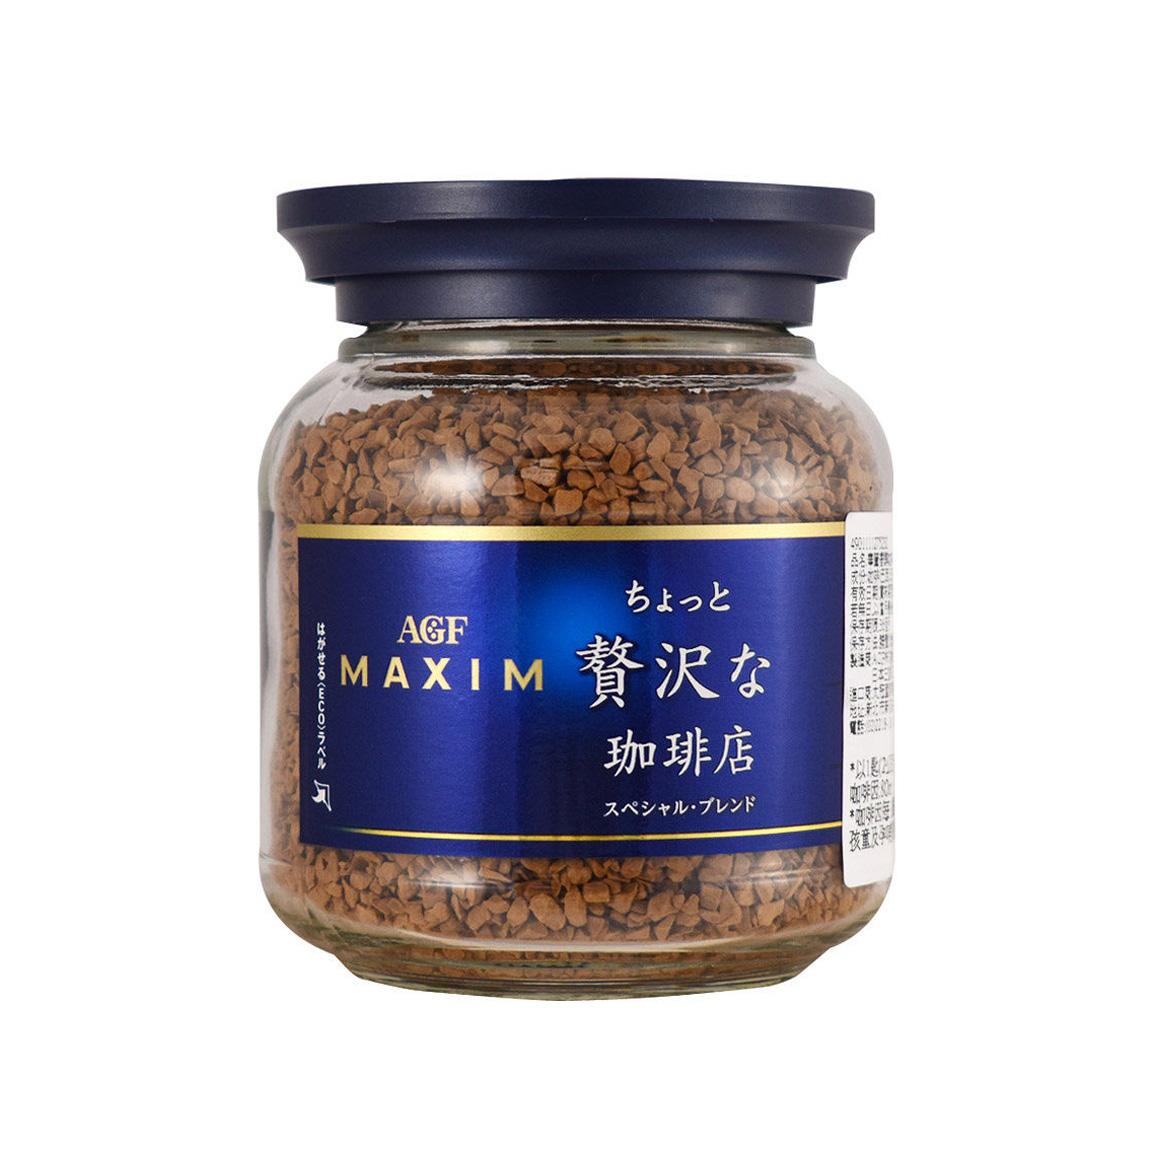 【AGF MAXIM】咖啡罐-華麗香醇(藍色)80G/2入